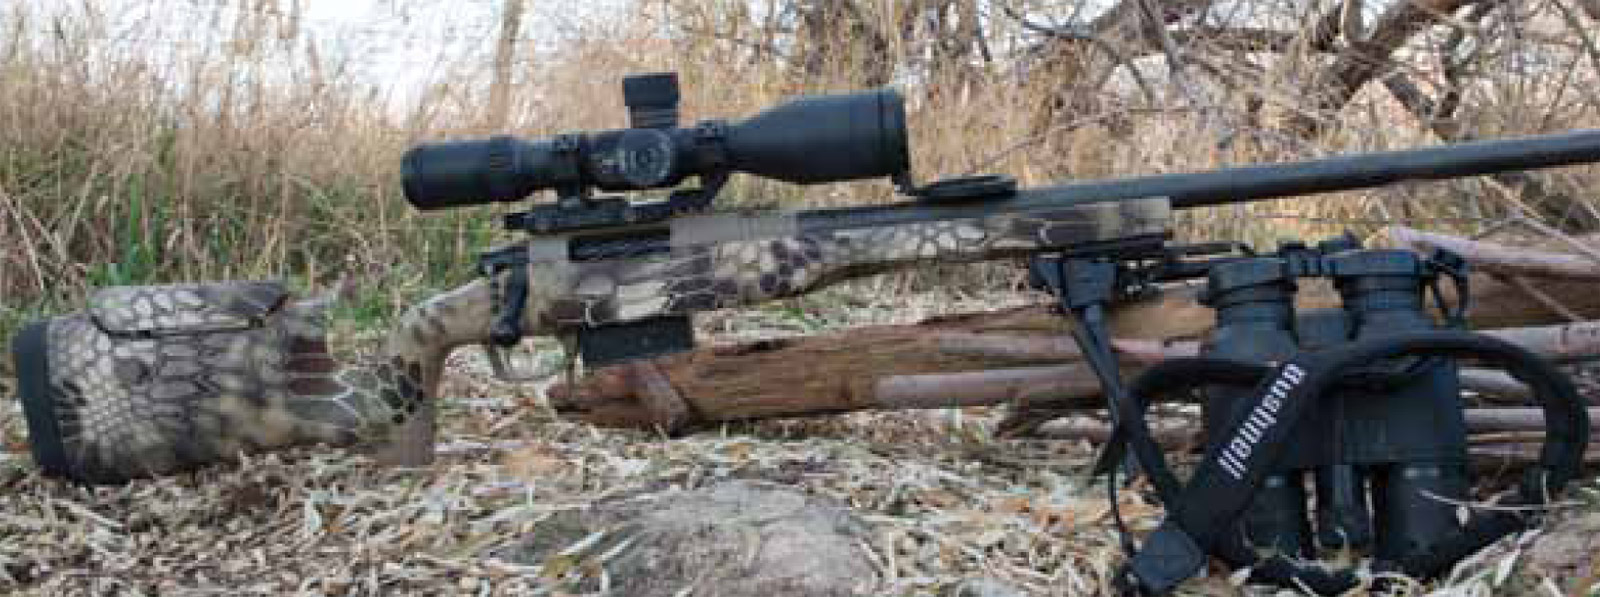 The Tactical II's Kryptek Highlander finish and flat-black, carbon-fiber barrel work well in the field.